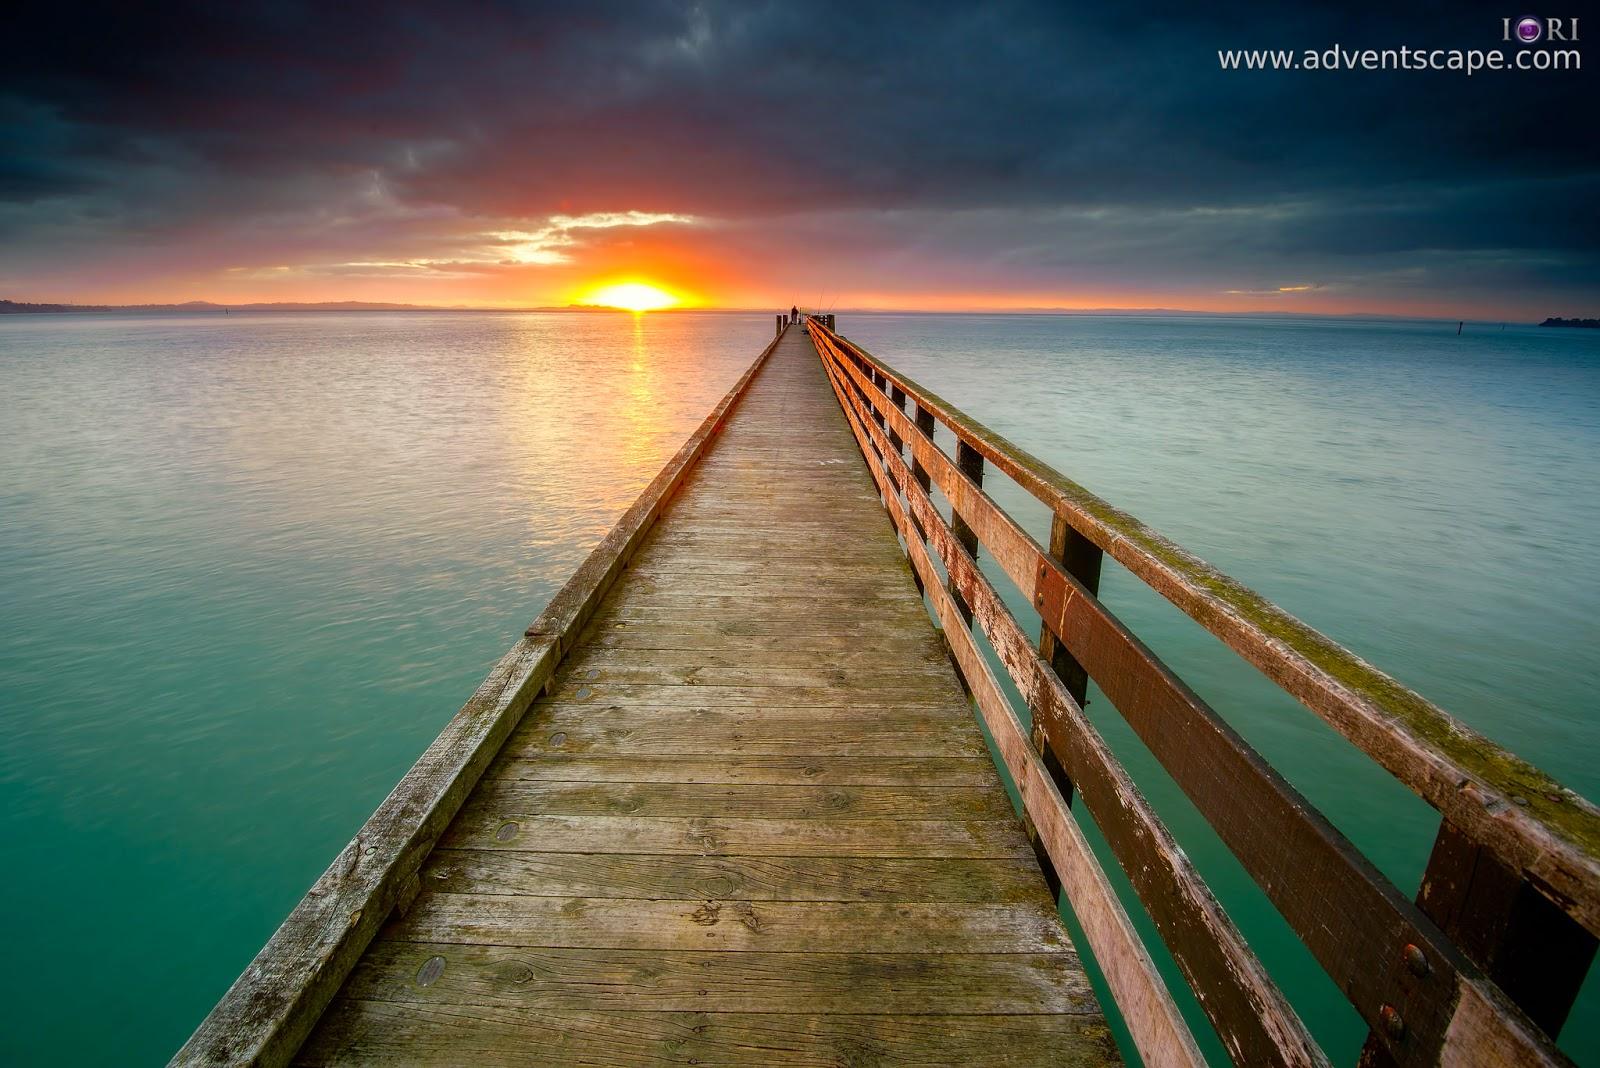 Philip Avellana, iori, adventscape, Cornwallis, jetty, seascape, landscape, North Island, New Zealand, fine art, sunrise